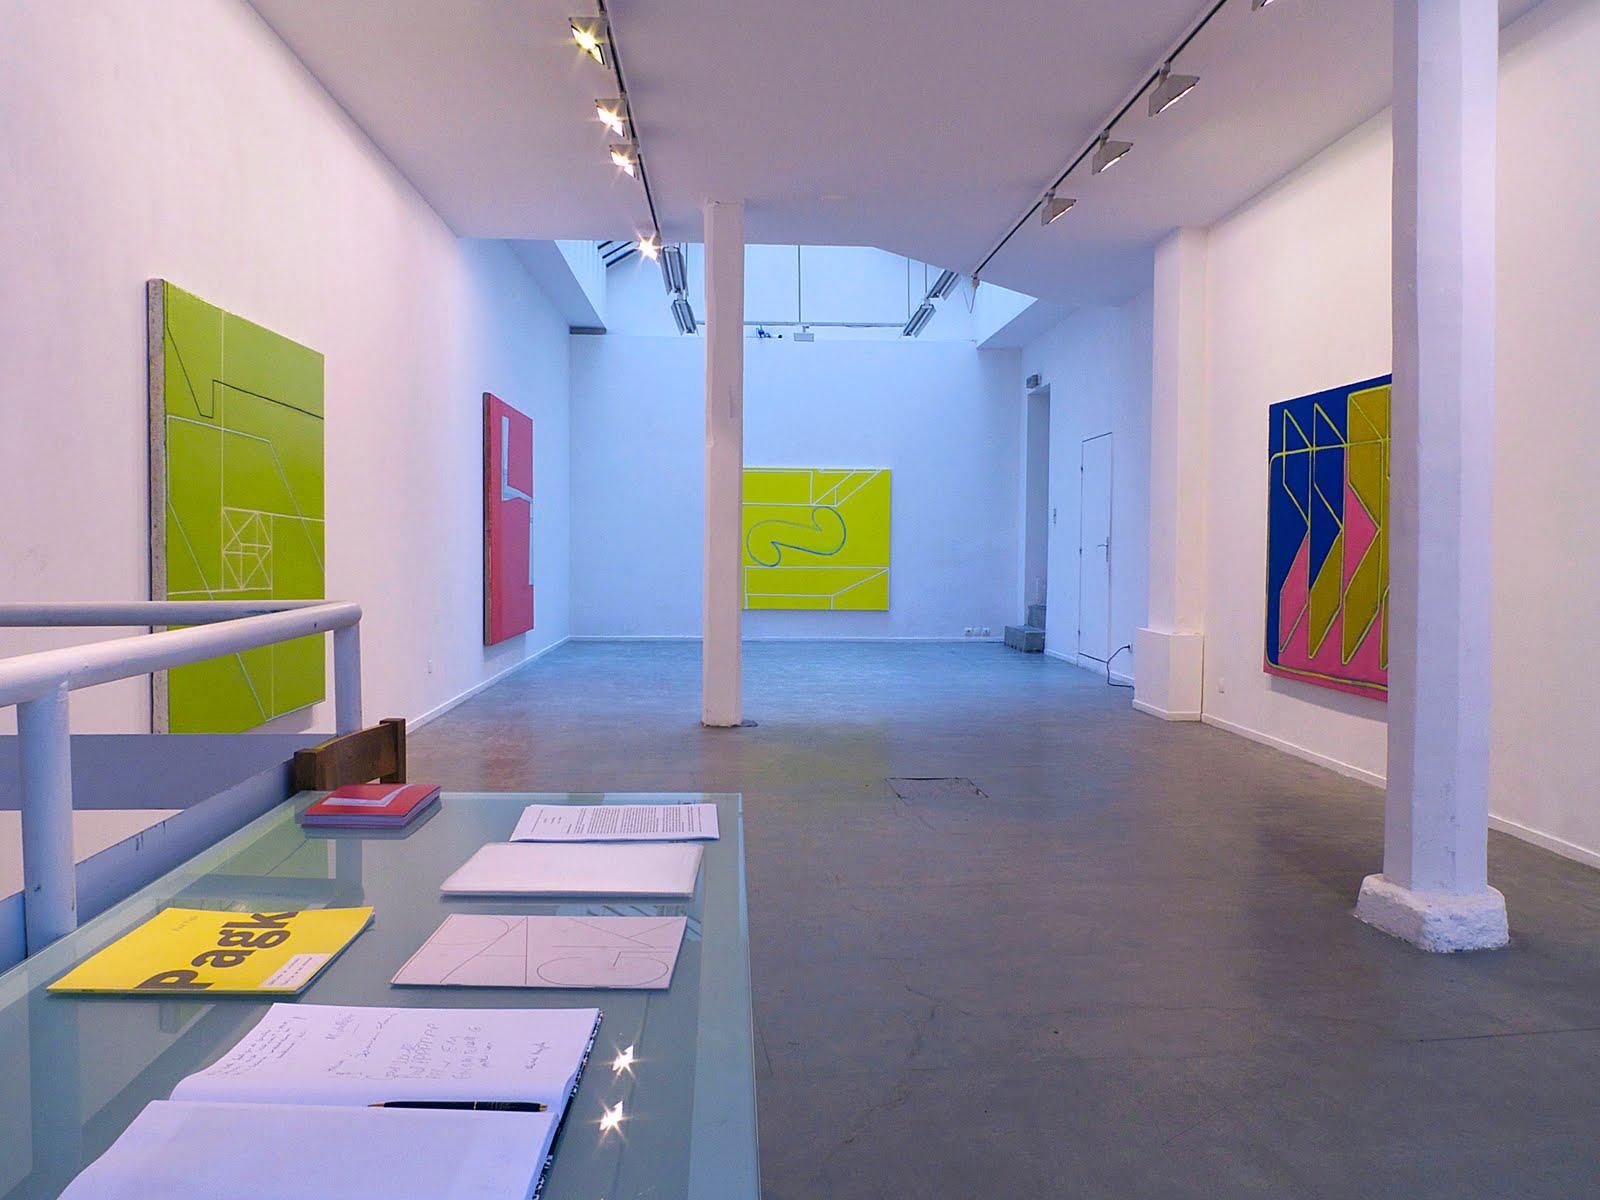 Galerie Eric Dupont, Paris: Solo show, 2010